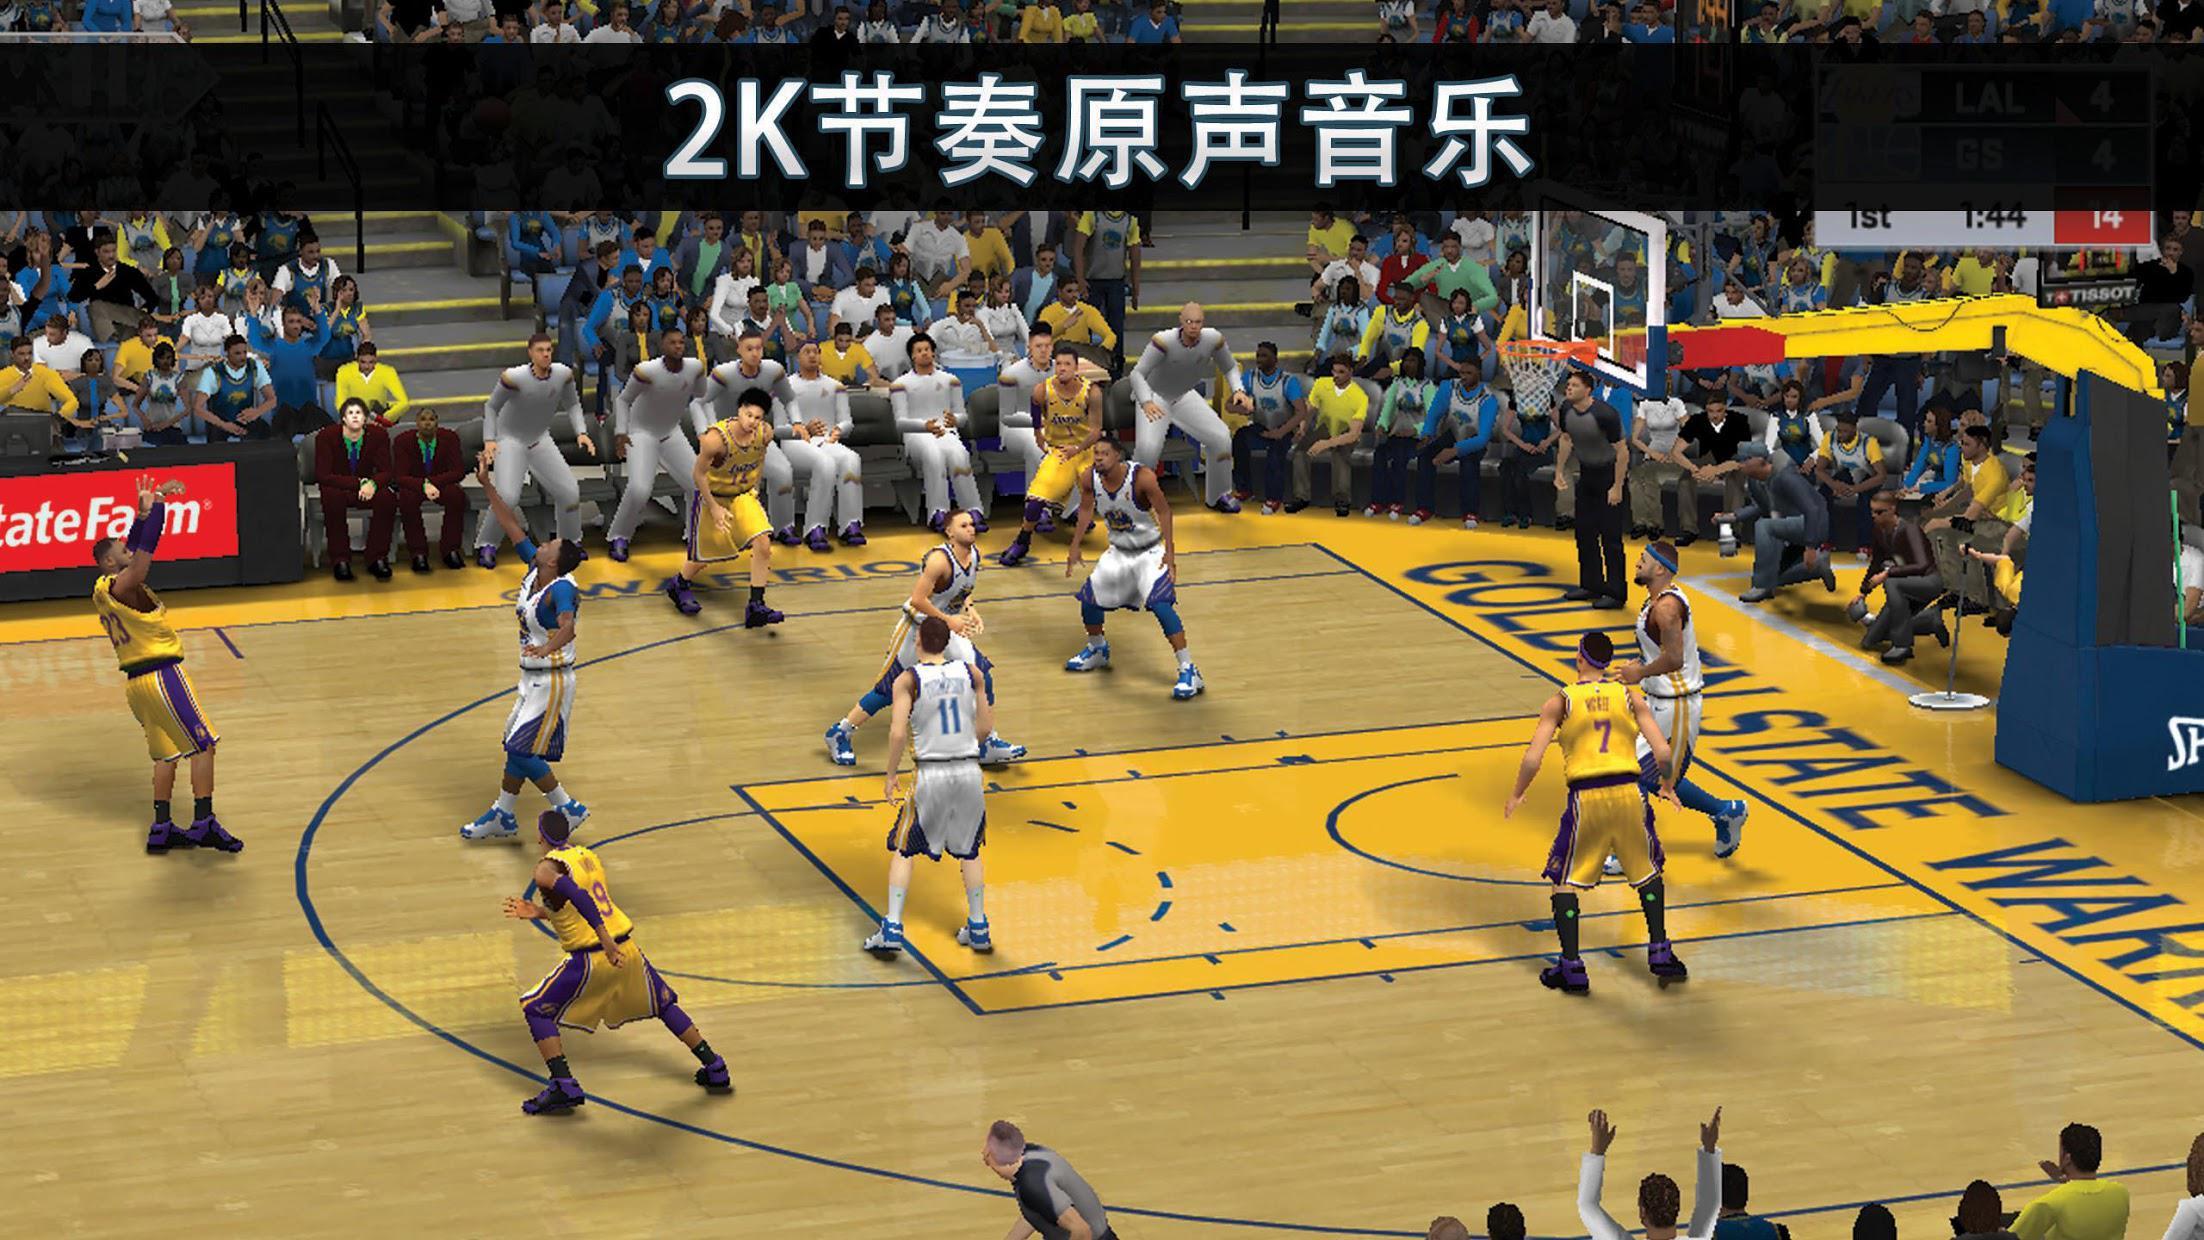 NBA 2K19玩着玩着突然黑屏怎么办